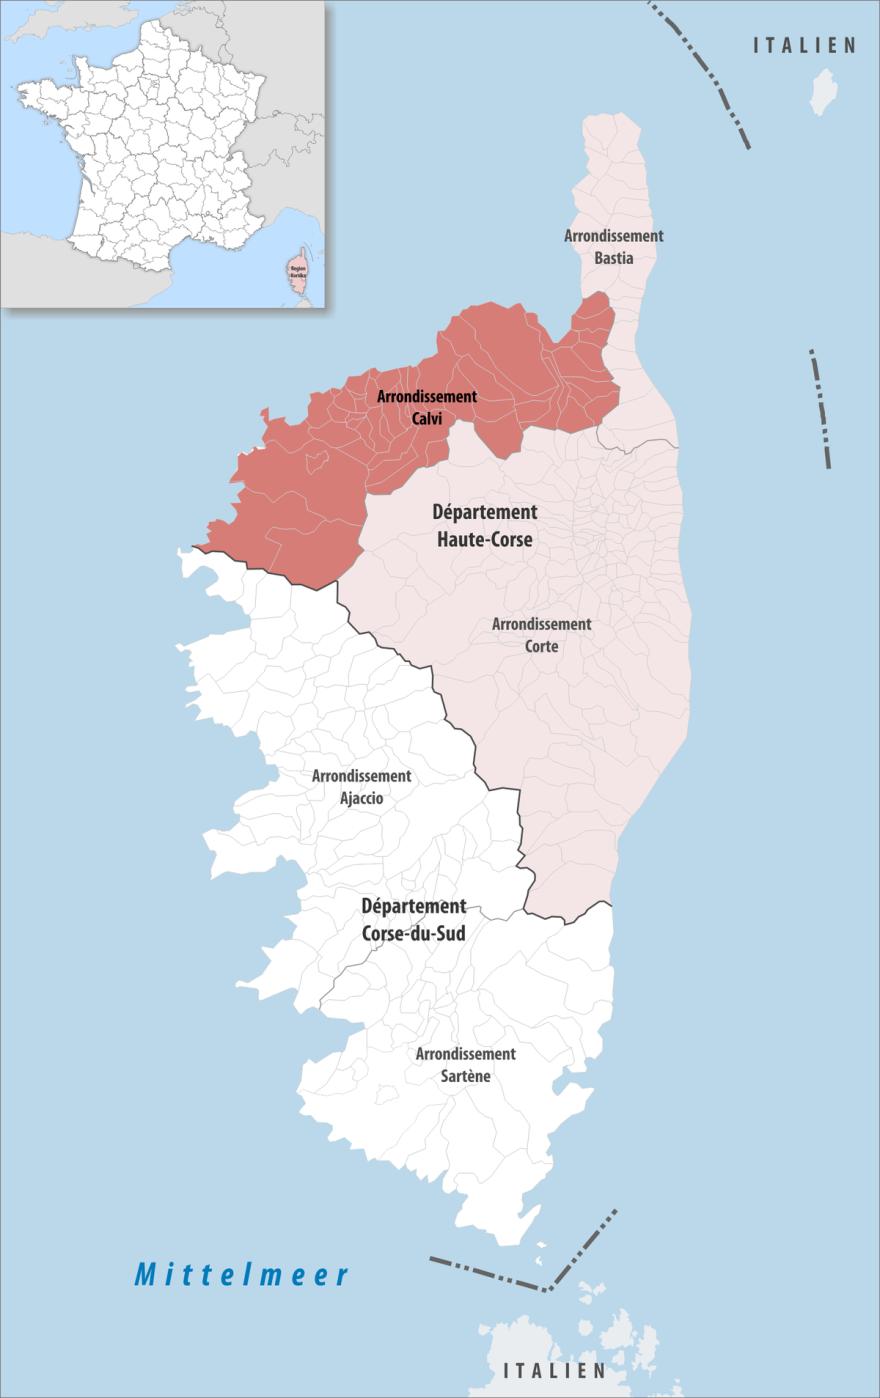 D:\A\1200px-Locator_map_of_Arrondissement_Calvi_2017.png